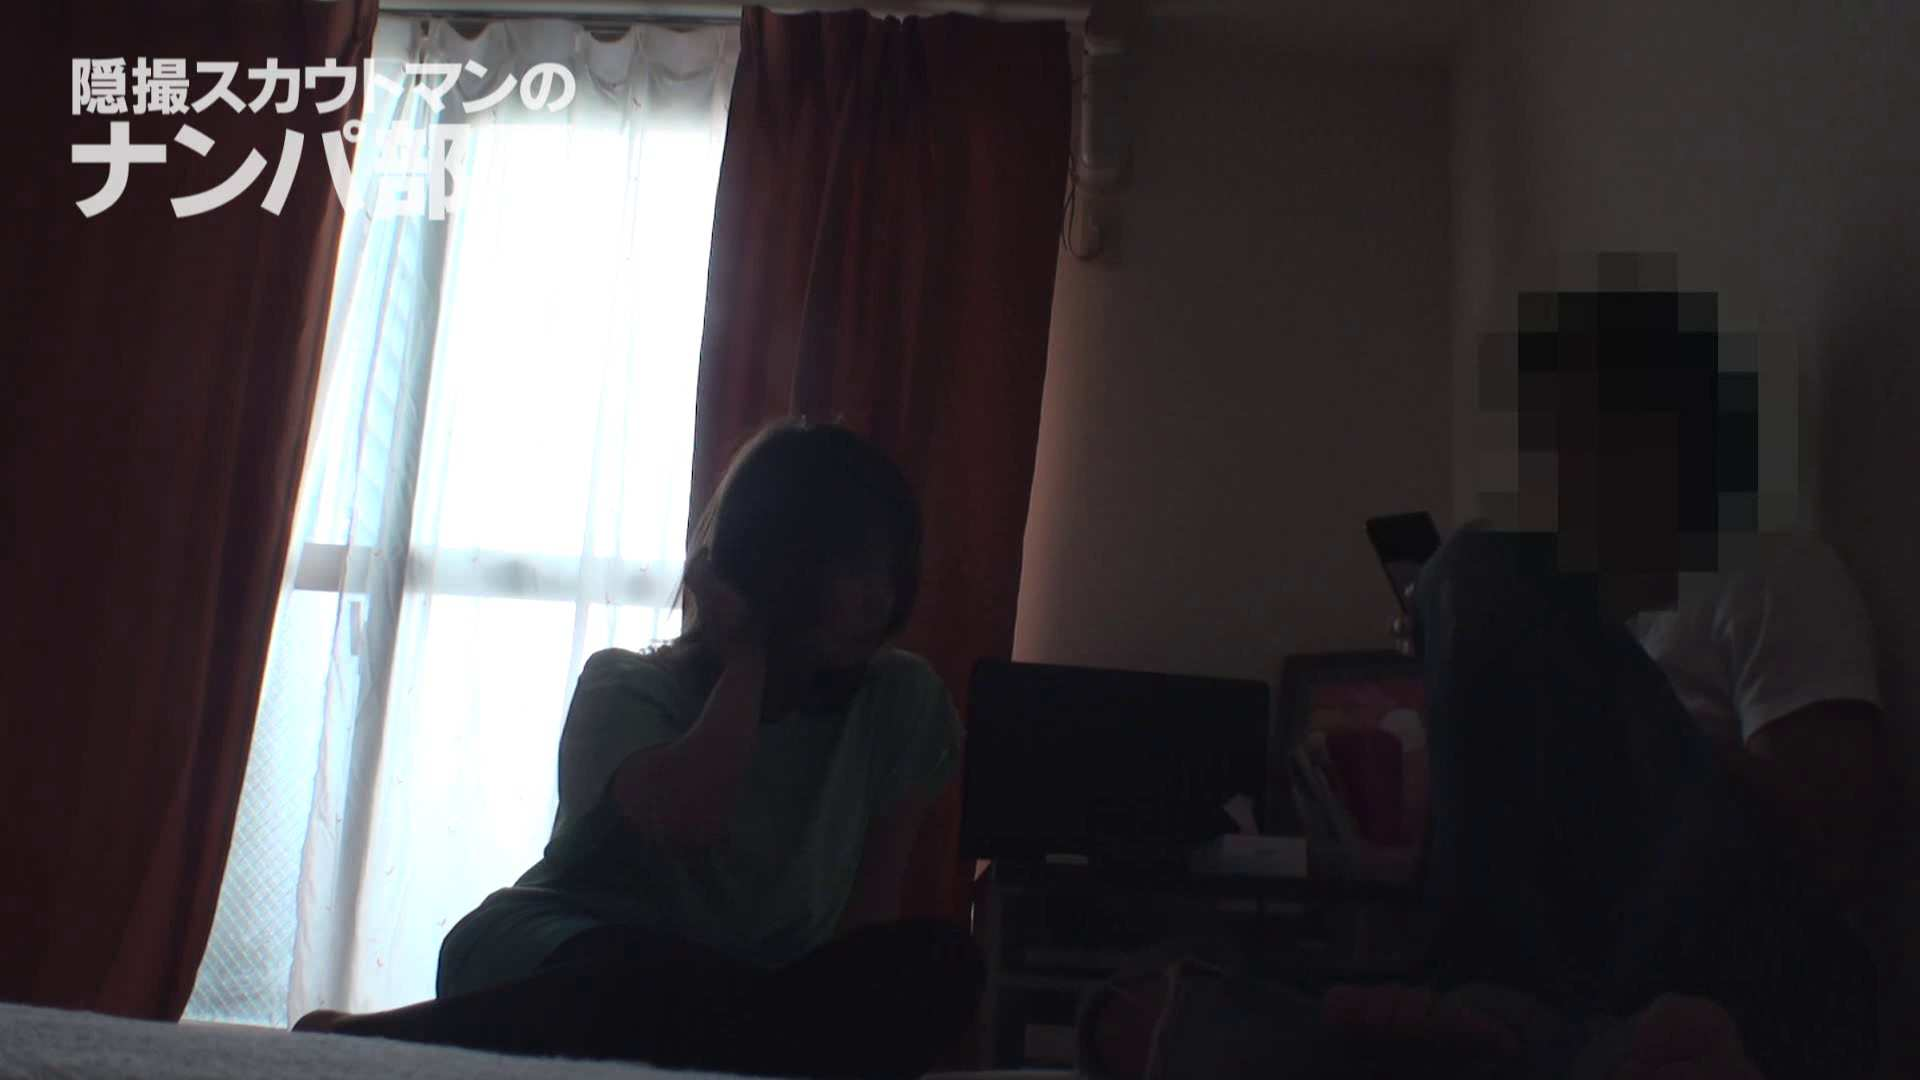 sii 脱衣所   フェラ動画  49画像 17